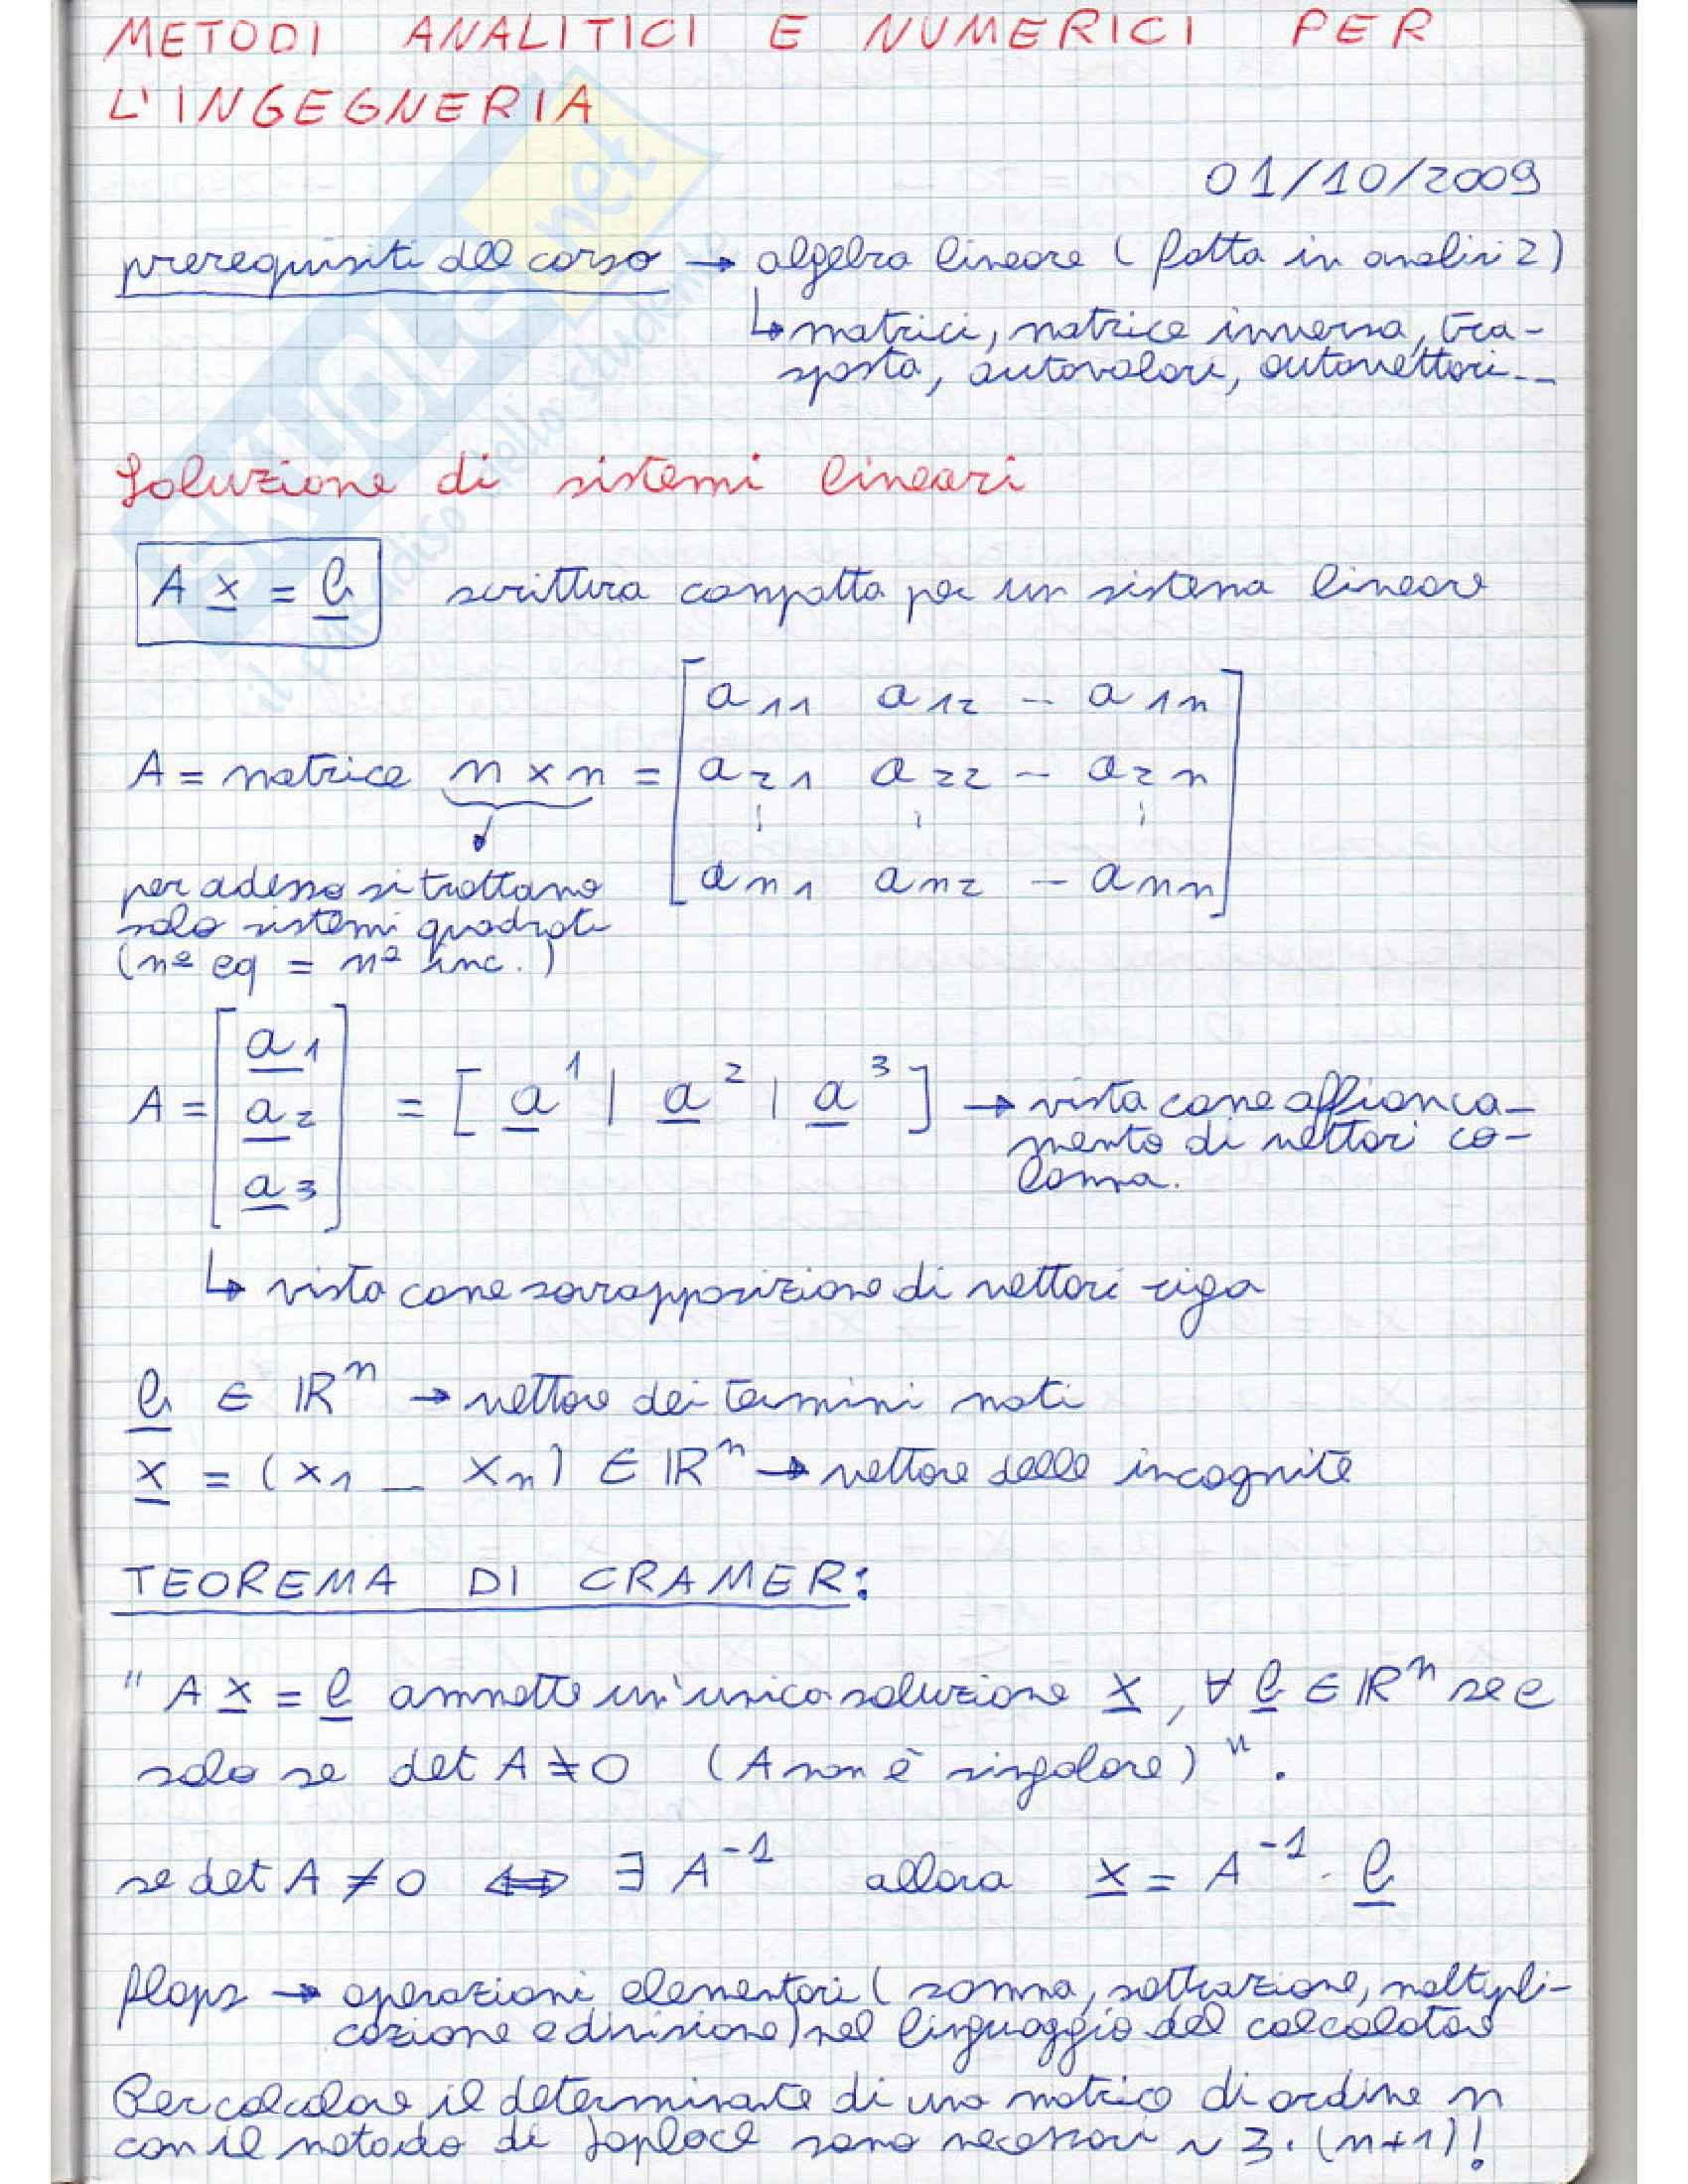 Metodi analitici e numerici per l'ingegneria - Appunti